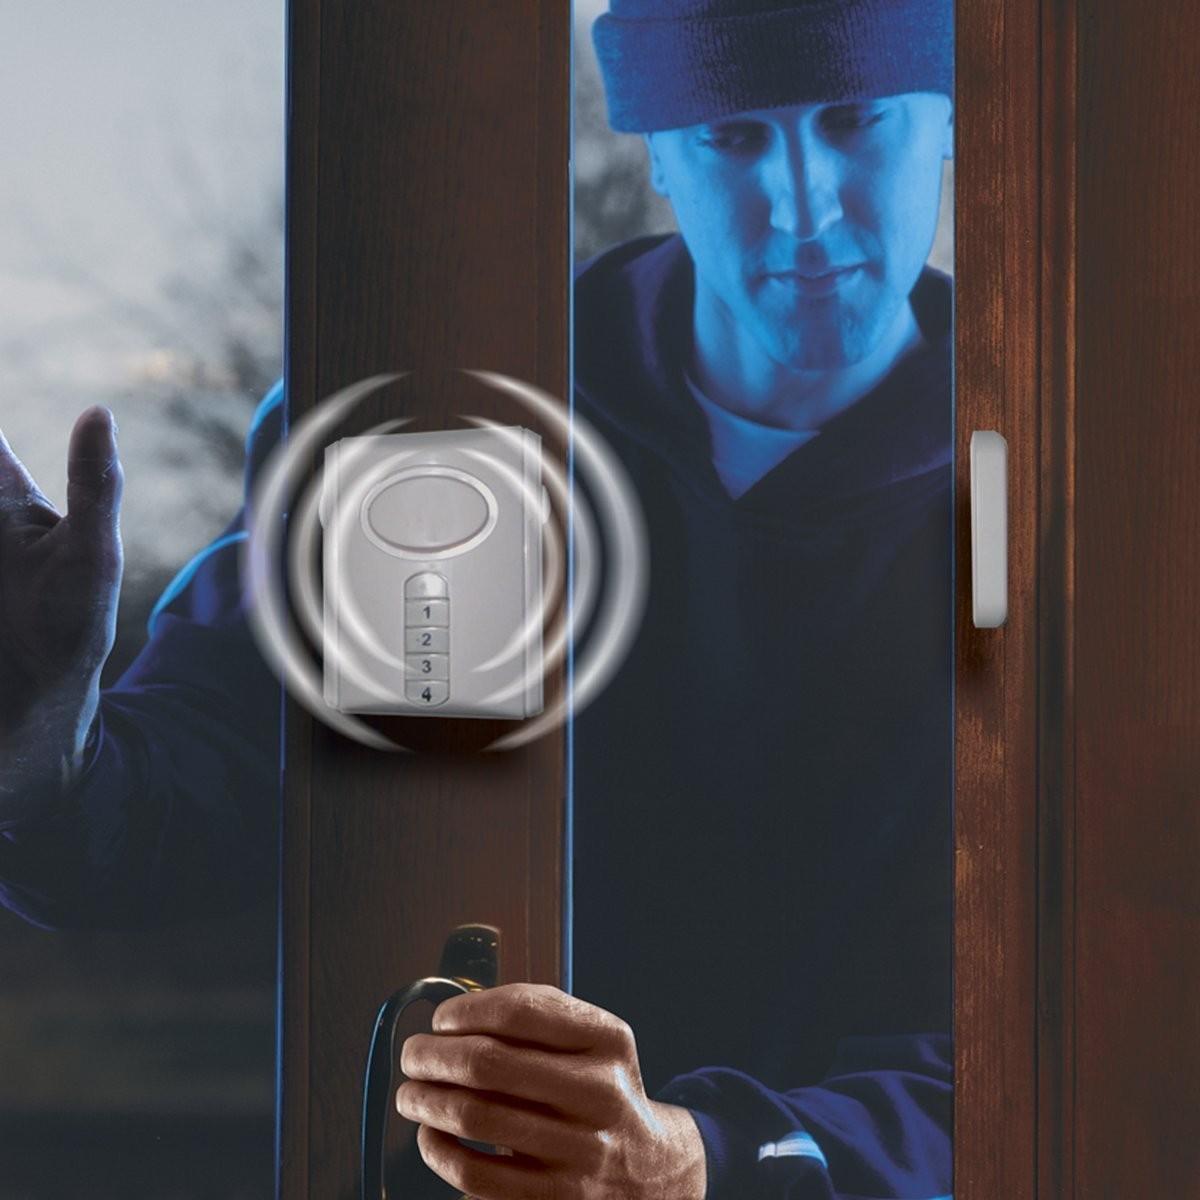 Deluxe Wireless Door Alarm General Electric 120 Decibel, Alarm or Entry Chime, Indoor Personal Security, with Keypad Activation, 45117